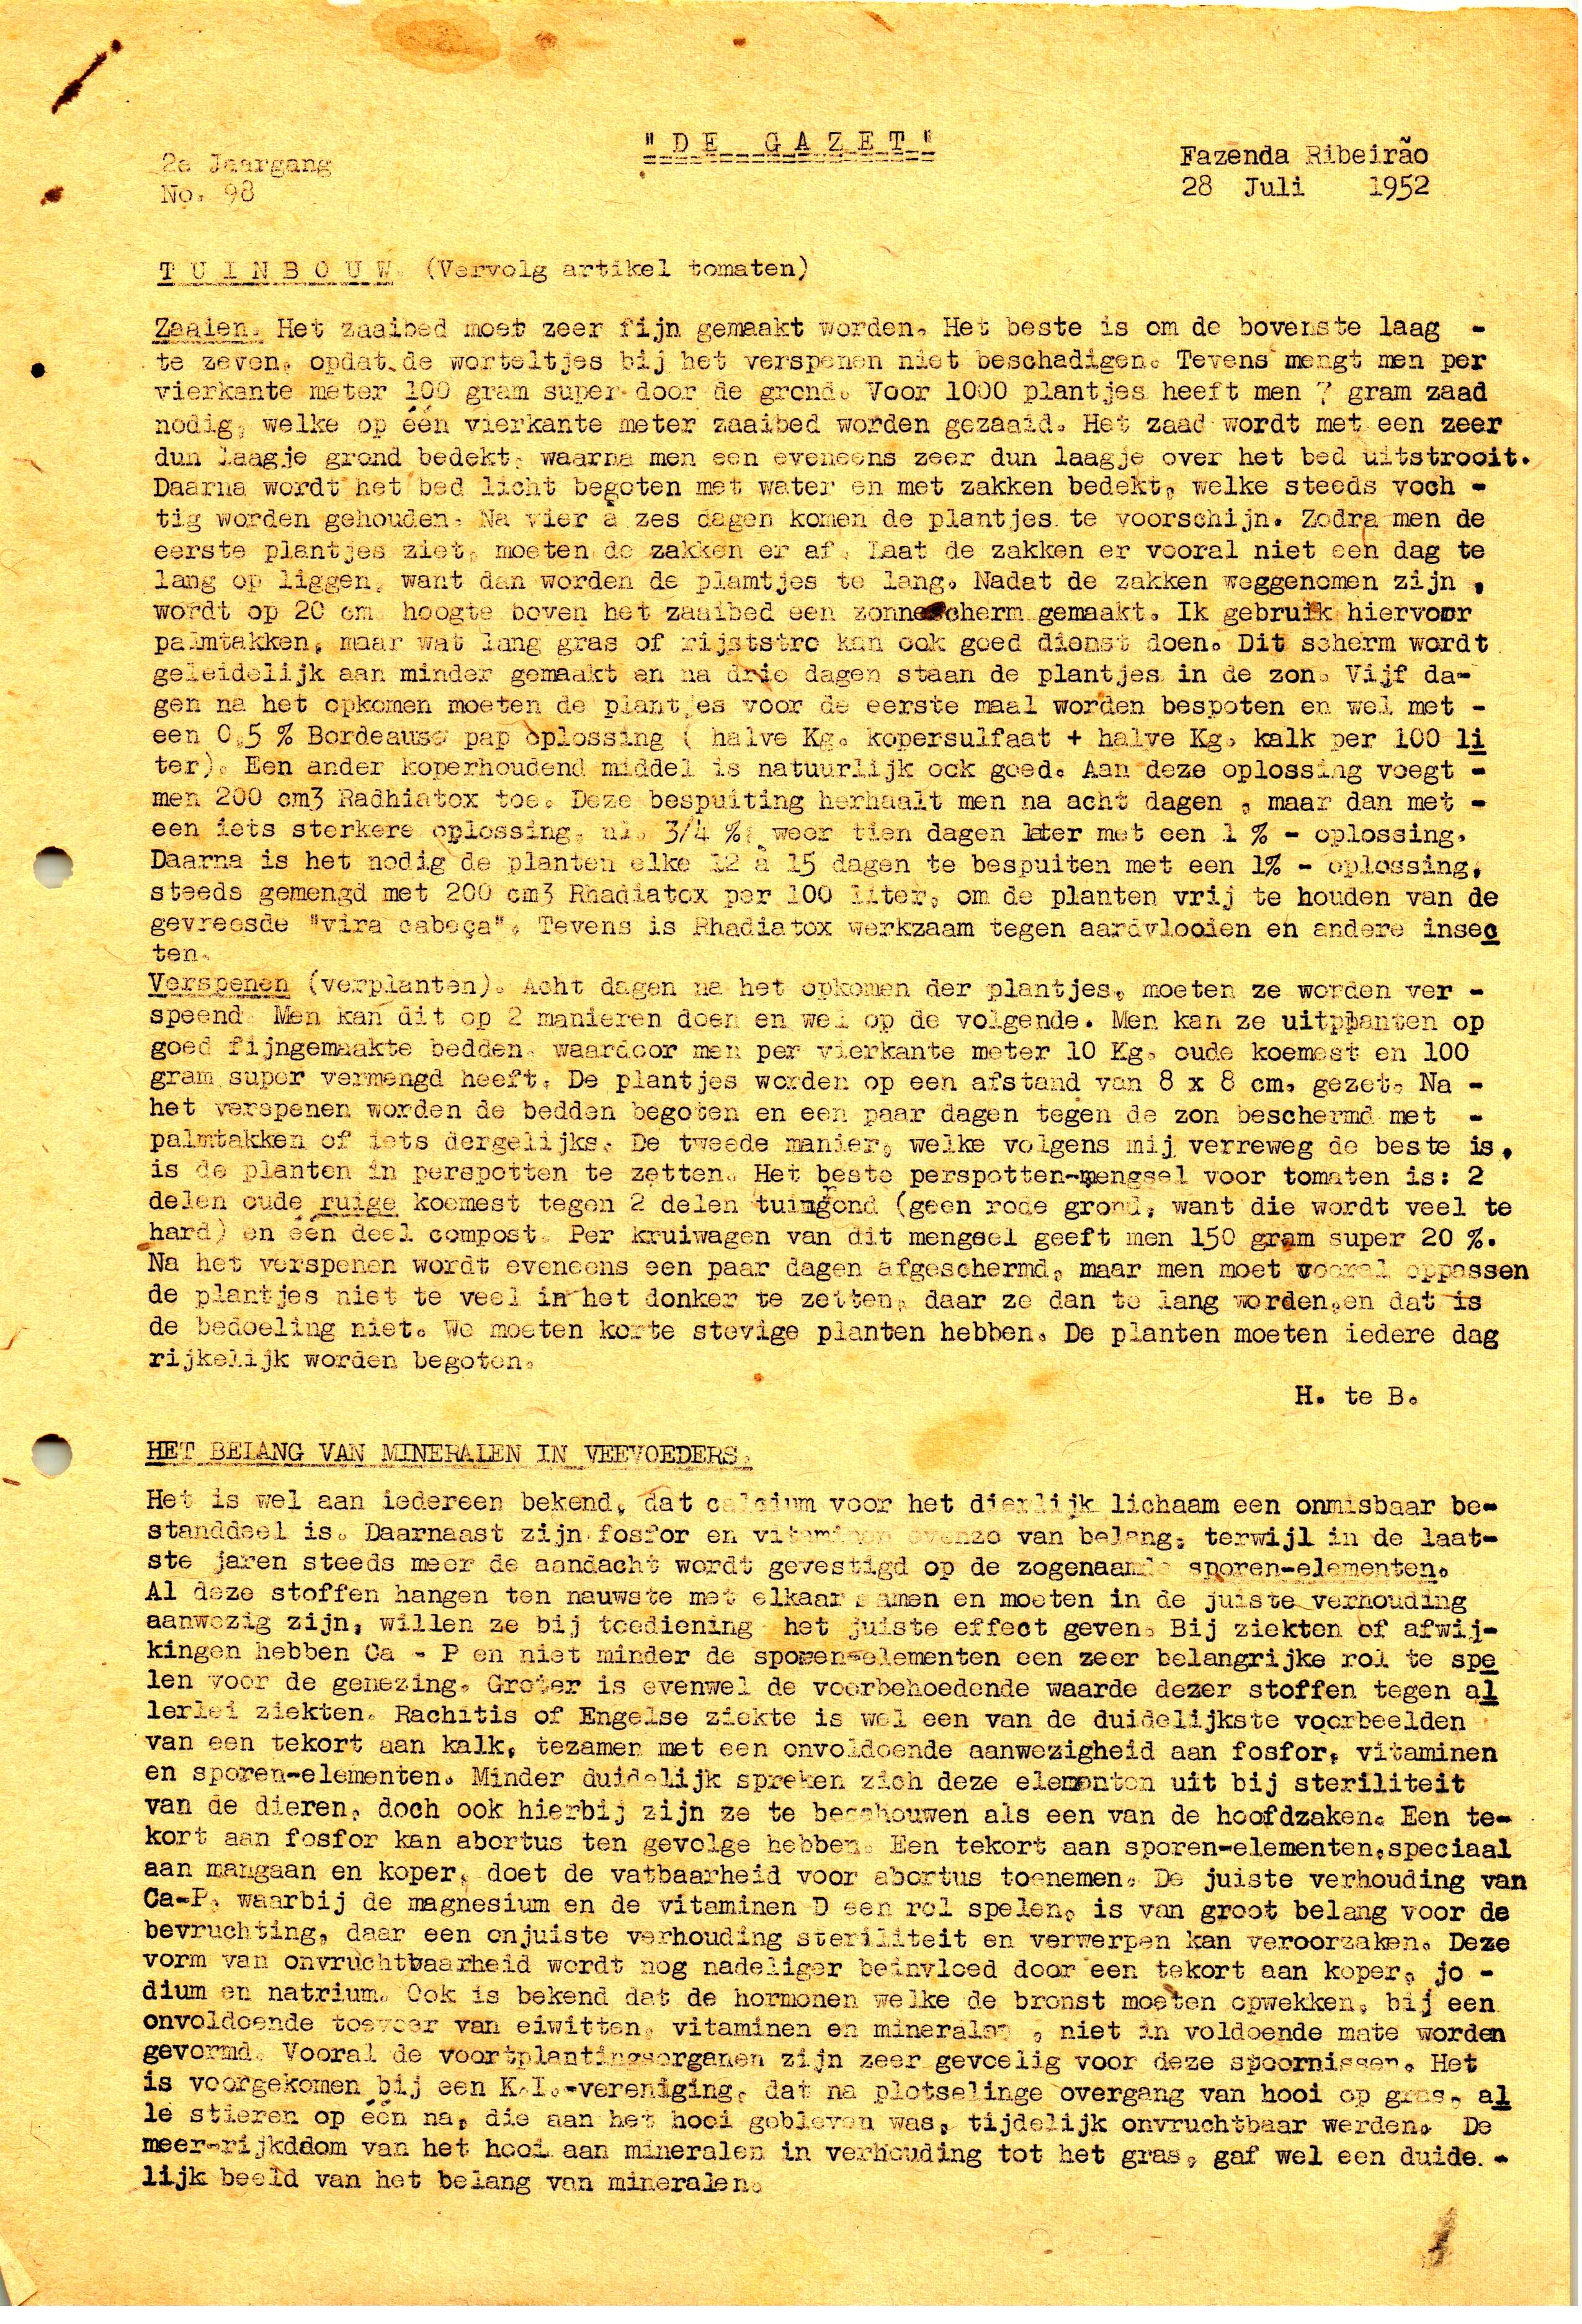 DE GAZET N°98 - 2° ANO